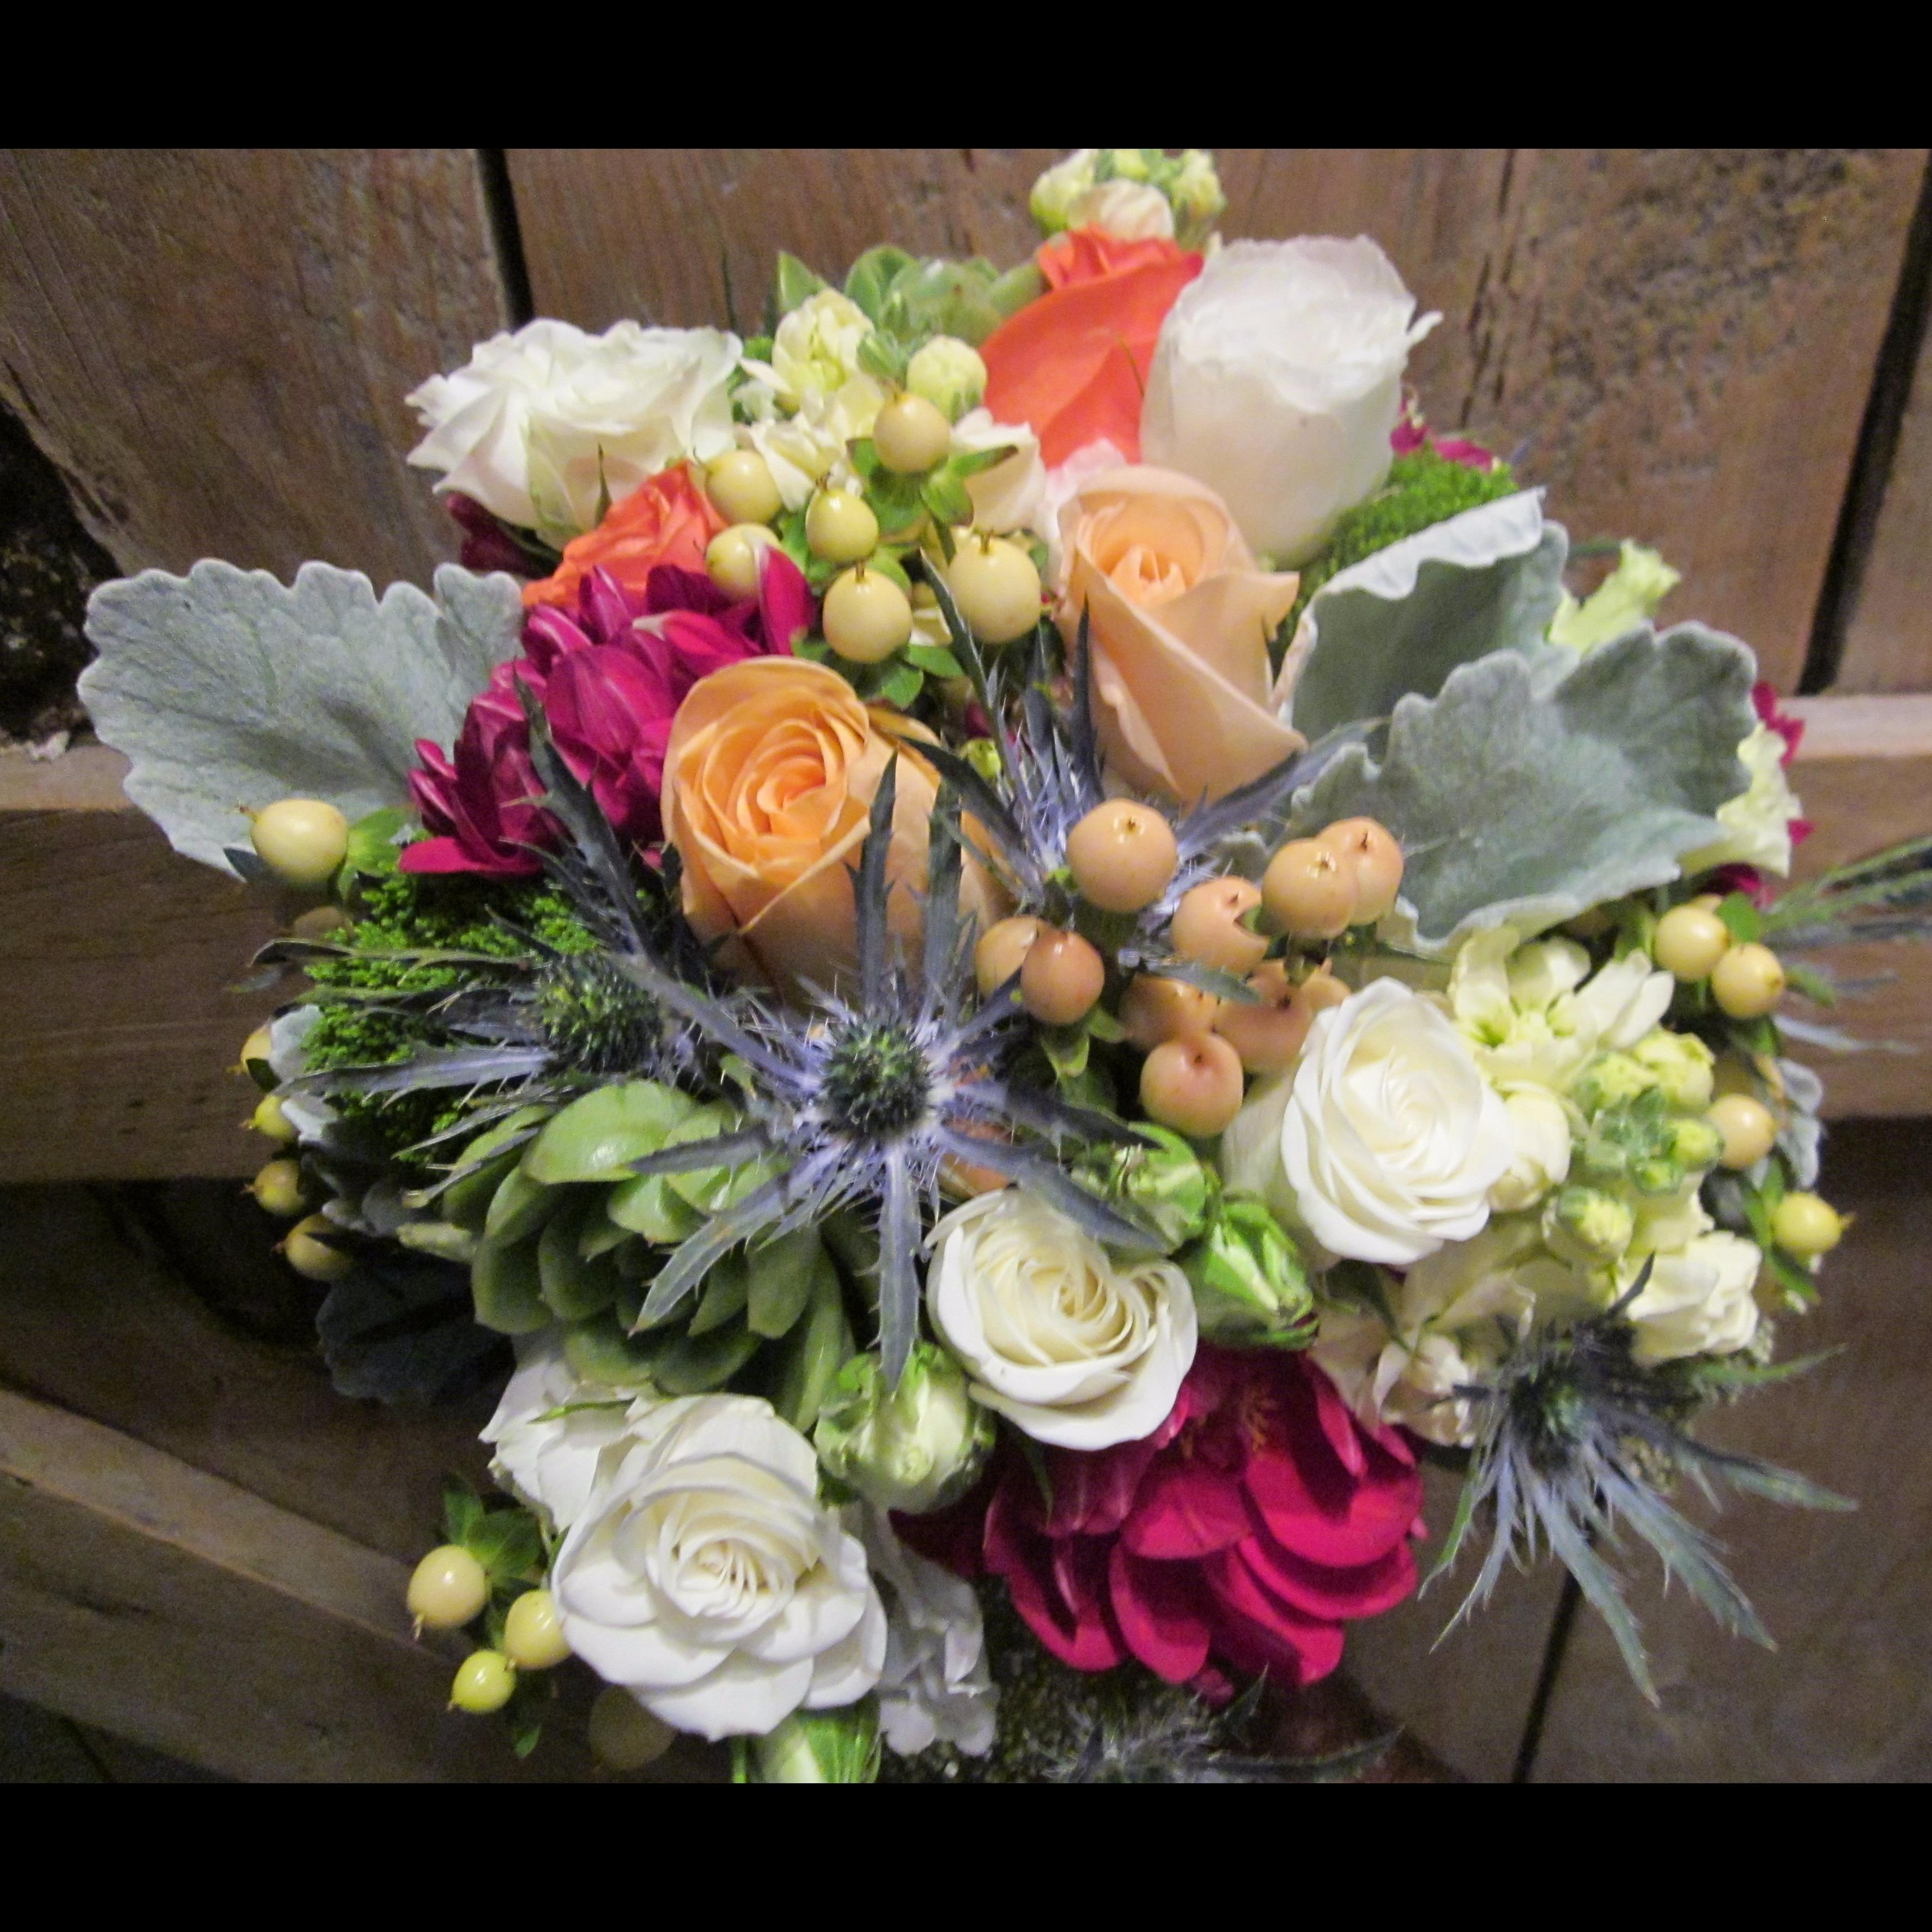 Creedon's Flower Shop